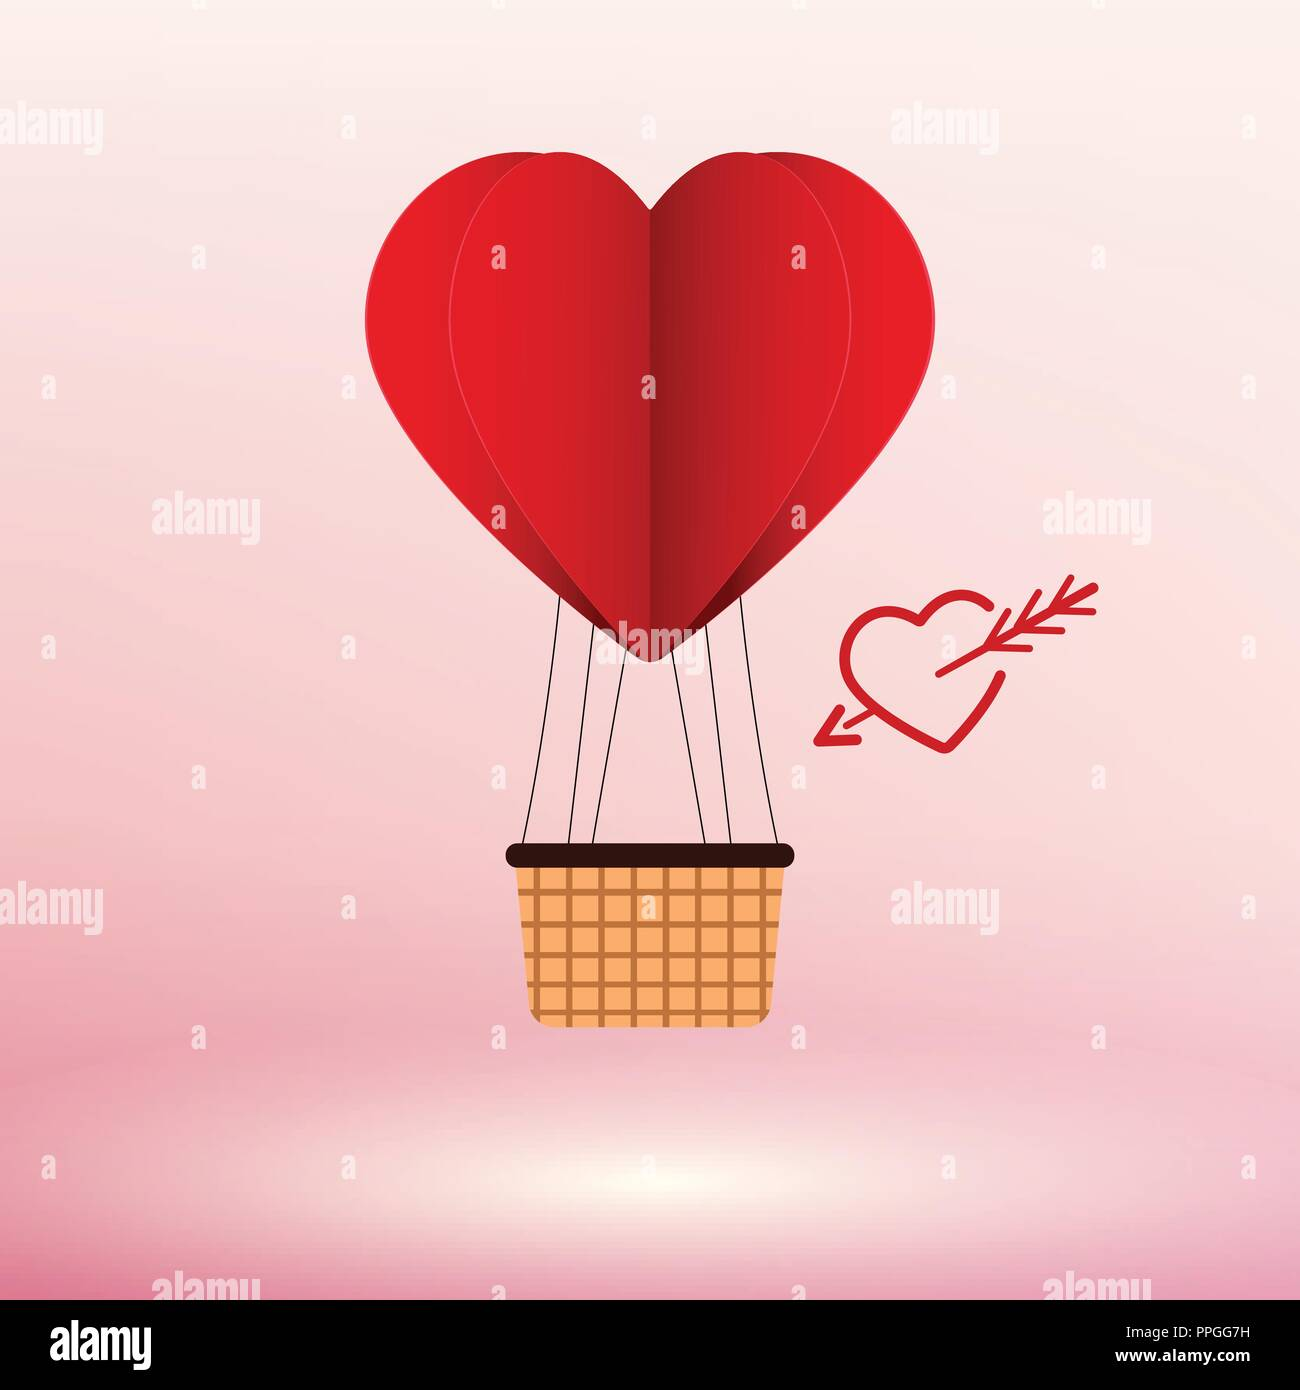 Paper Art Heart Air Balloon Vector illustration Concept - Stock Image